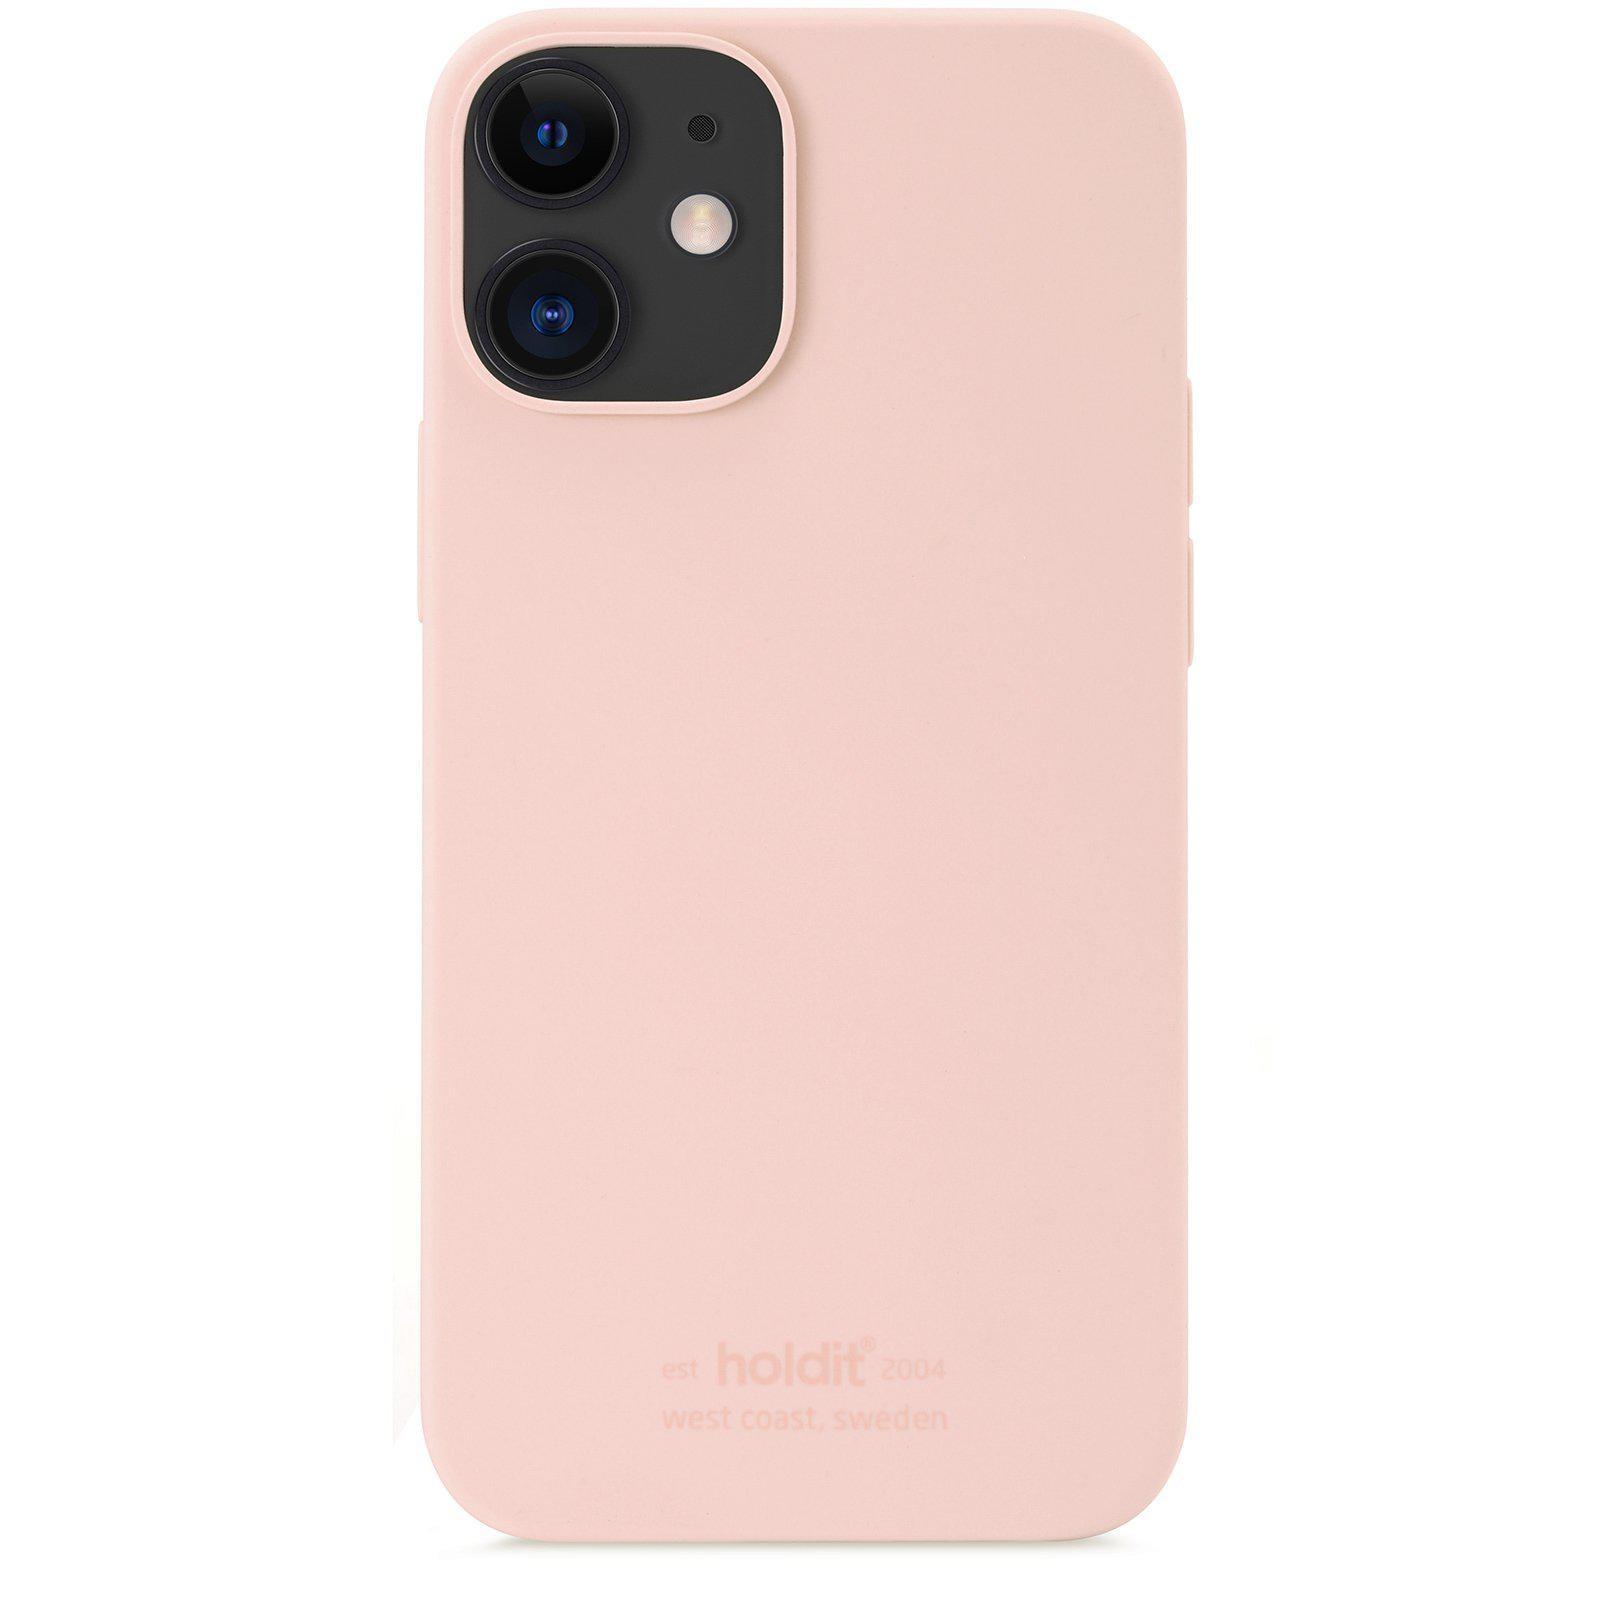 Silikonikuori iPhone 12 Mini Blush Pink